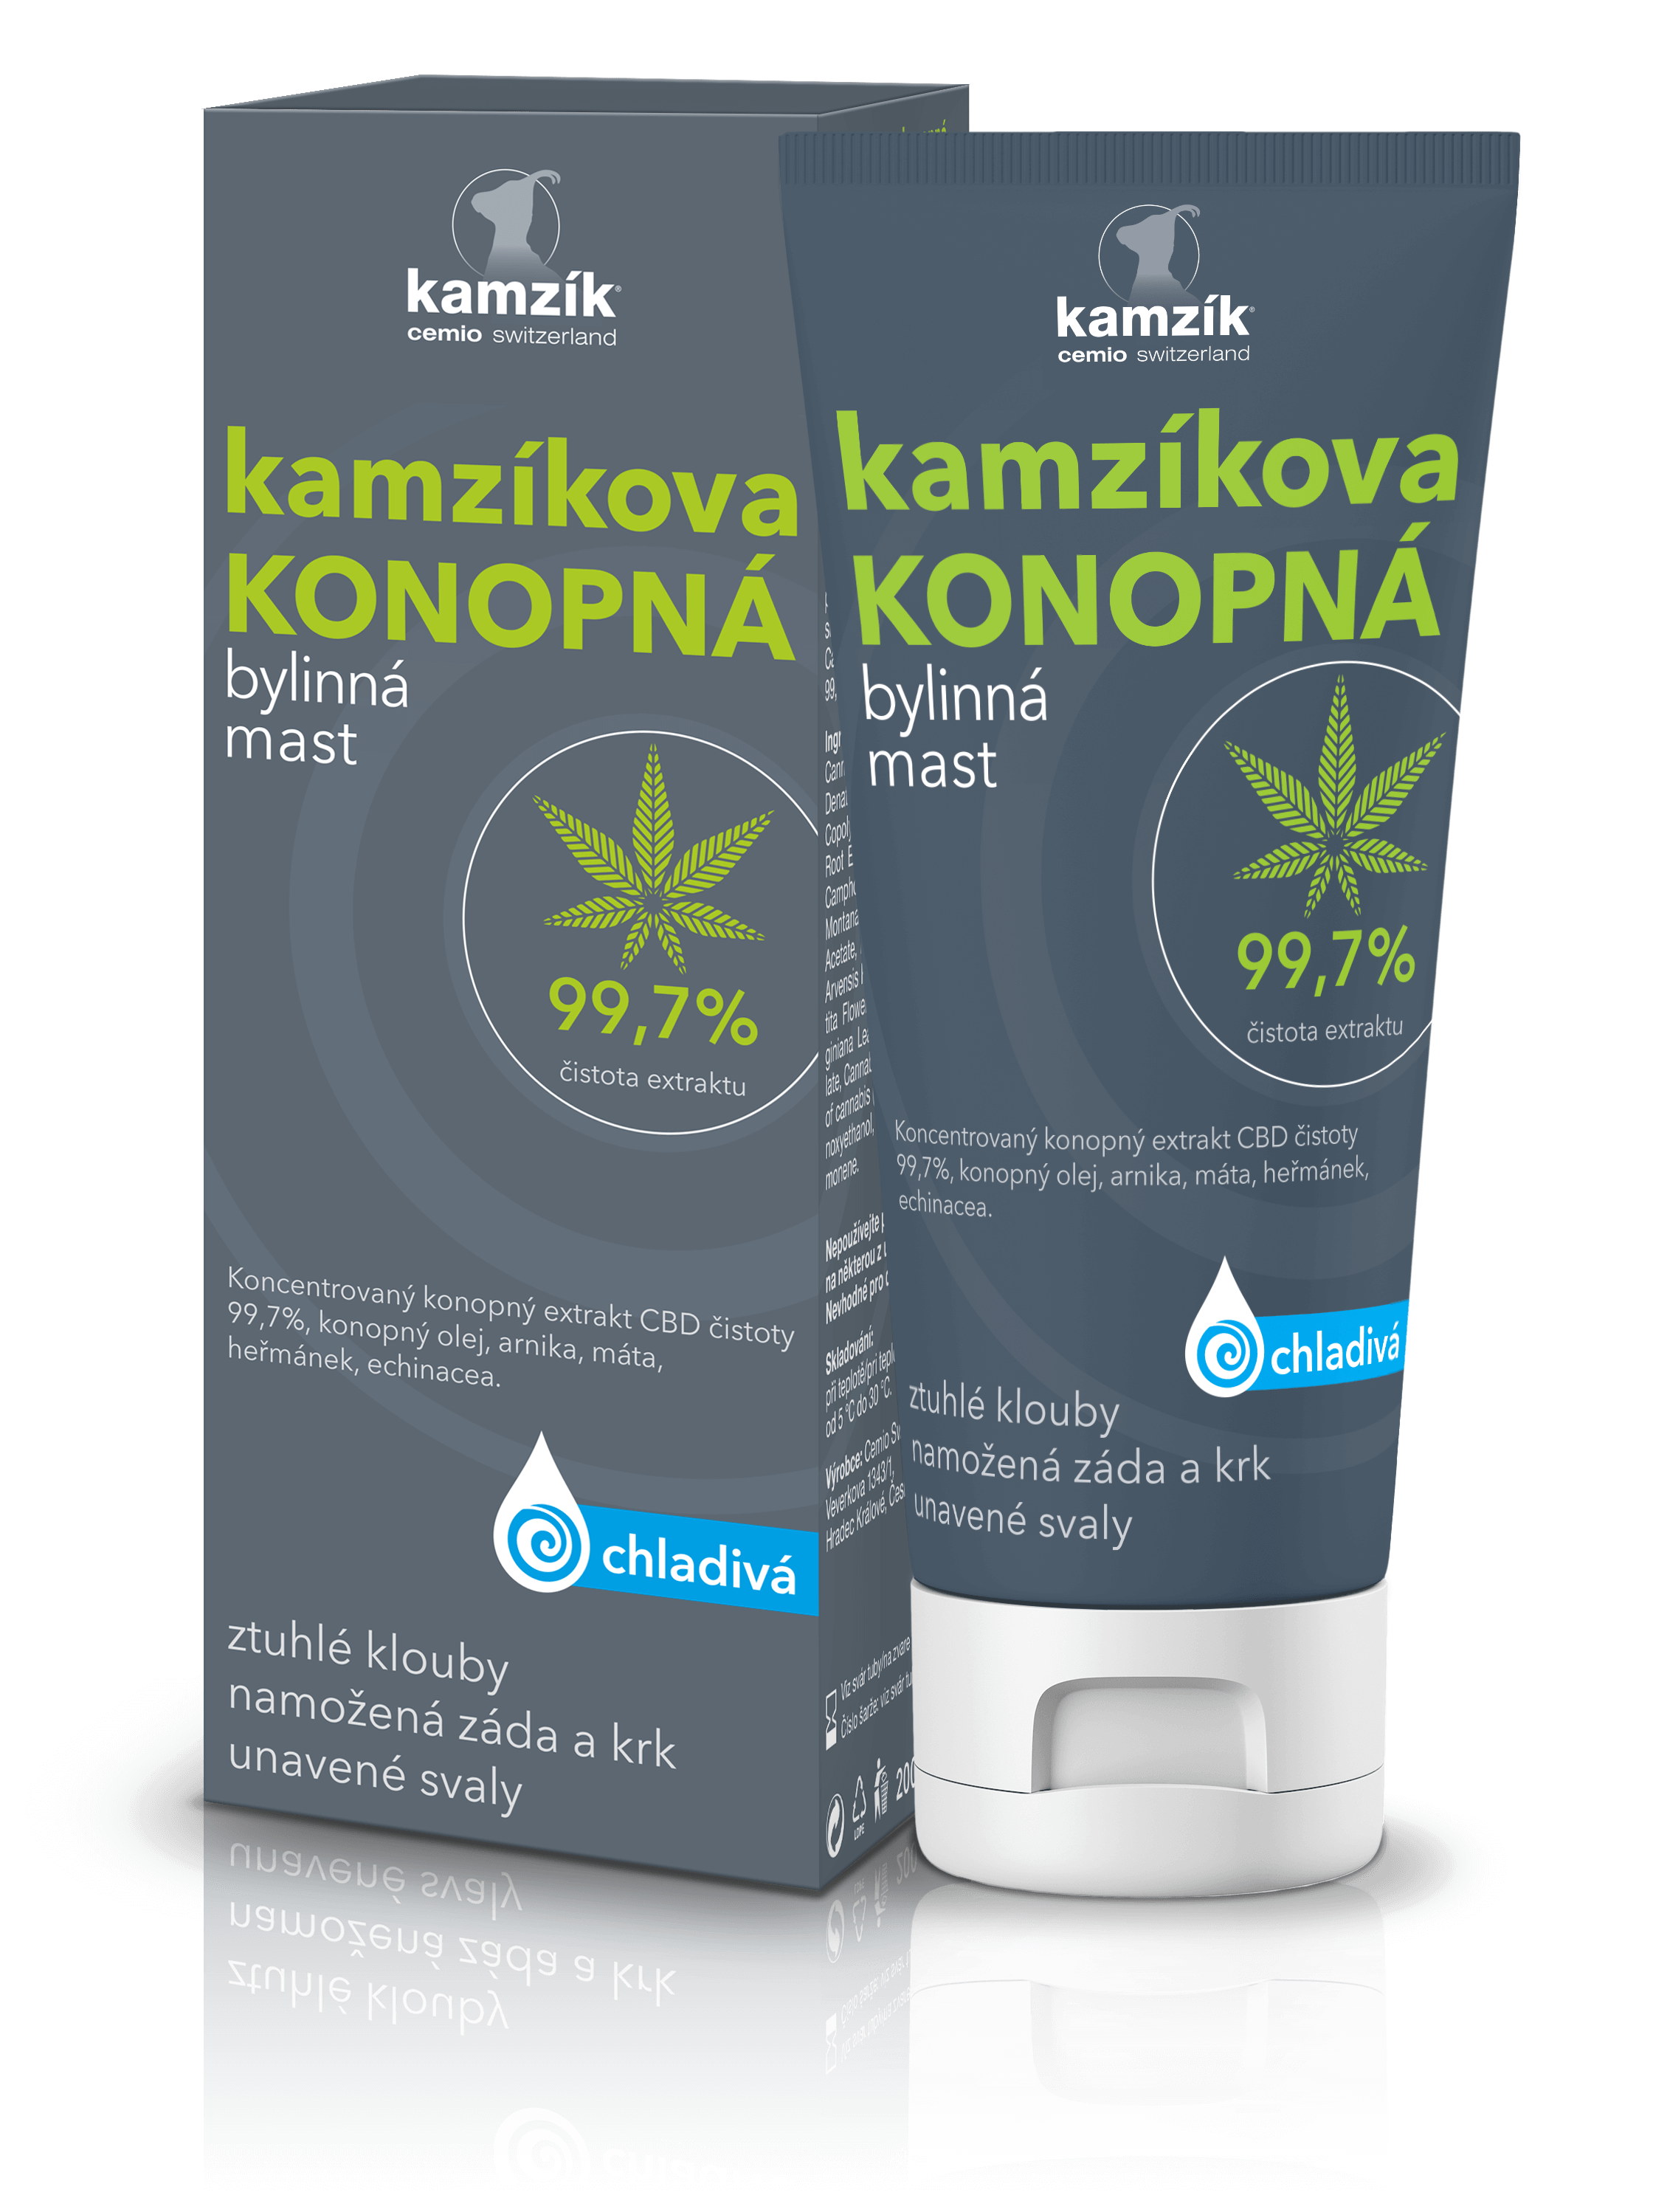 KAM_Konomast_chladiva_CZ_tuba